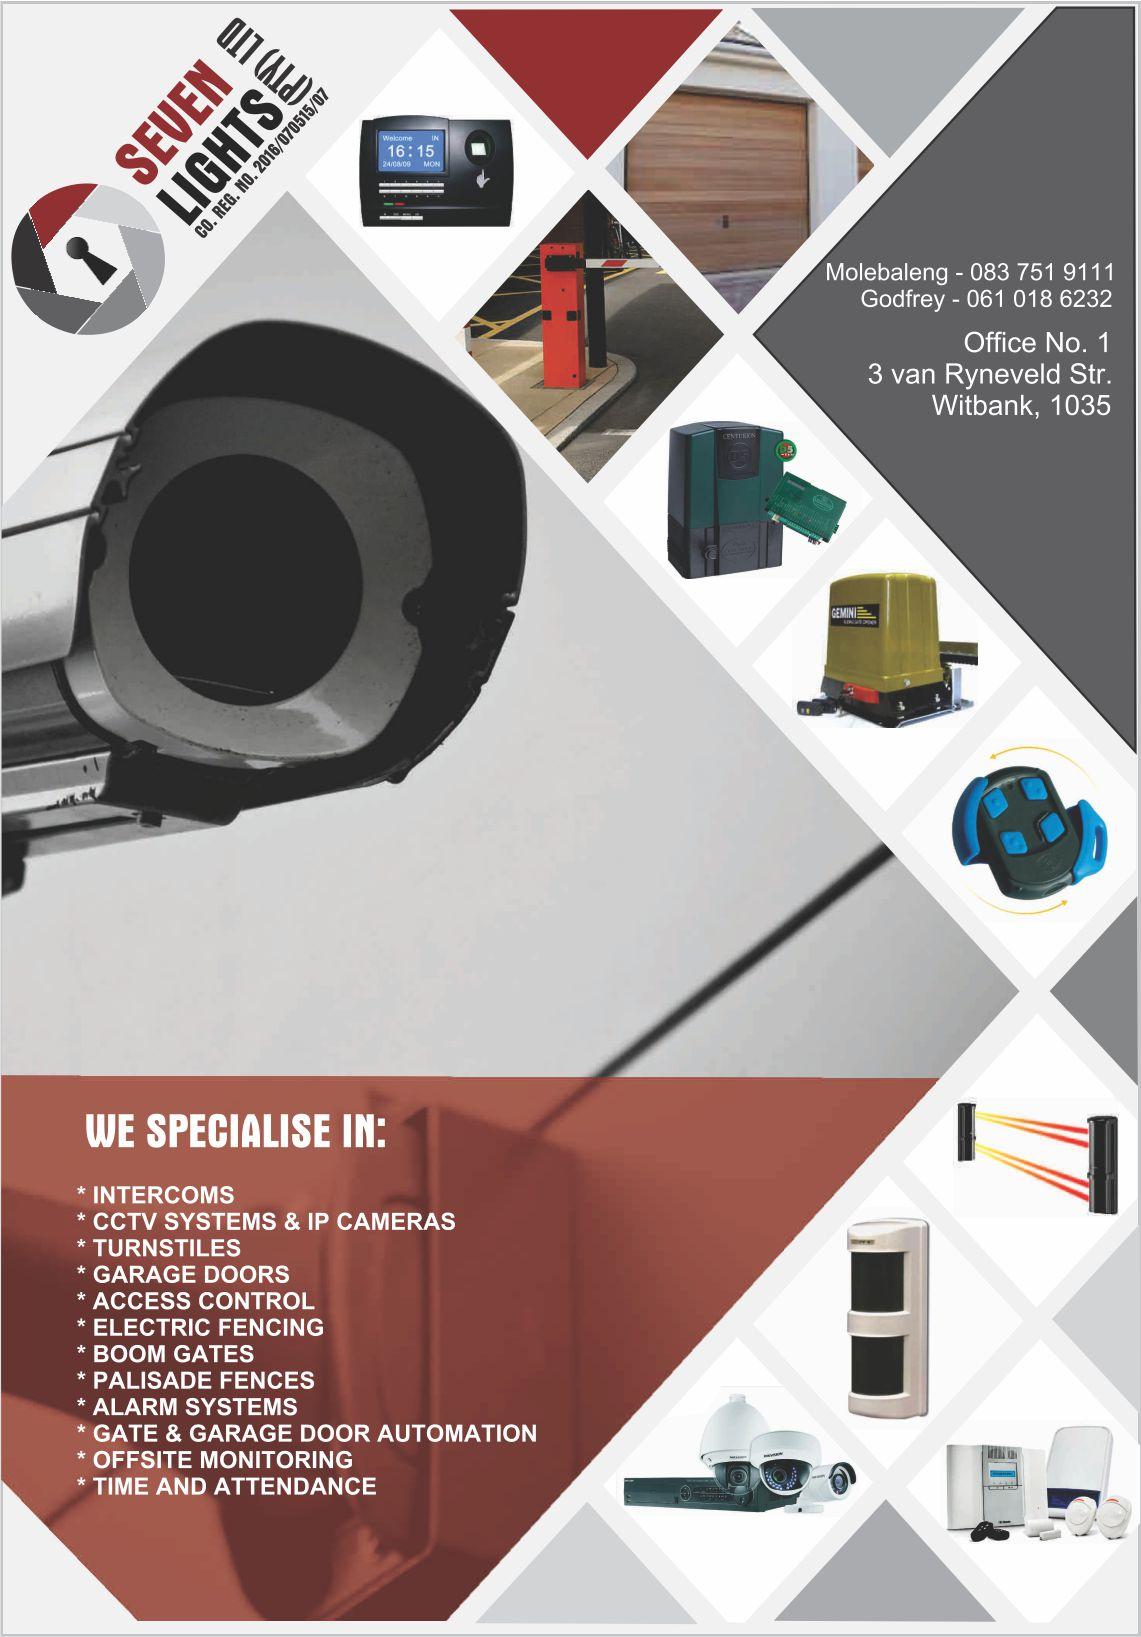 INSTALLATION OF GATE MOTORS, GARAGE DOOR AND MOTORS, ALARM SYSTEMS, CCTV, IP CAMERA, HANDYMAN SERVICES